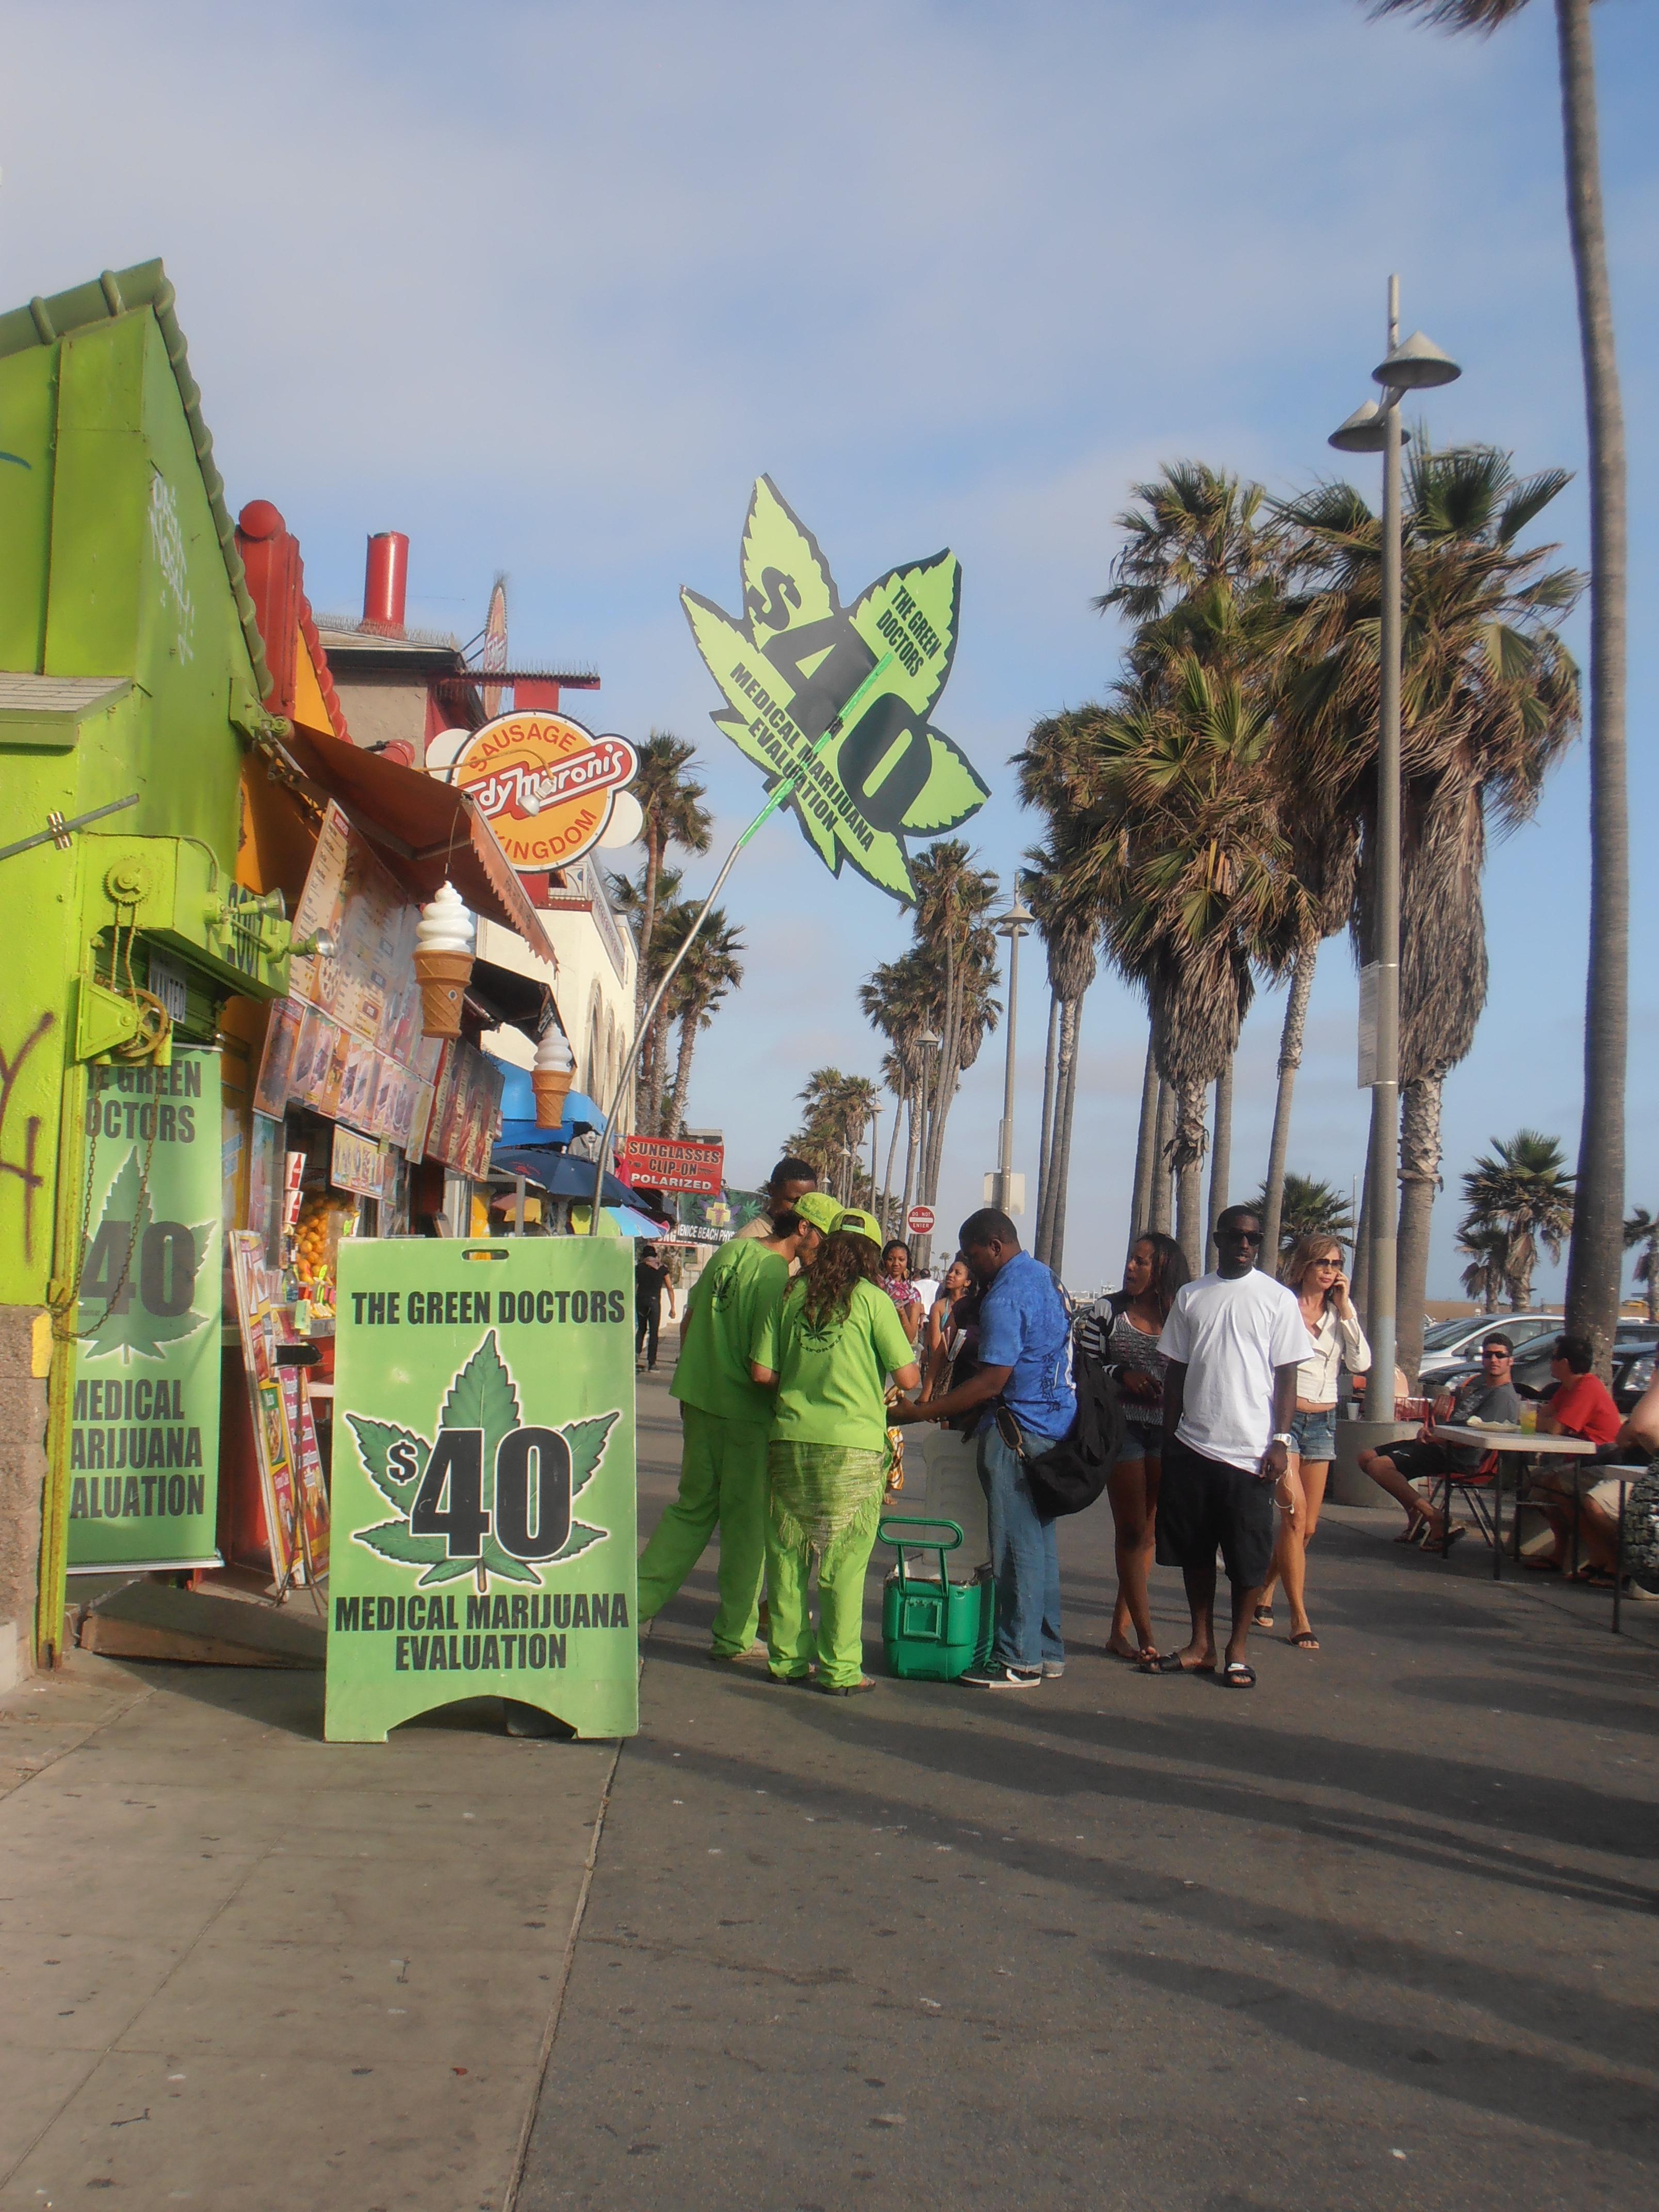 California Dreaming: Venice Beach Is A Freakshow!